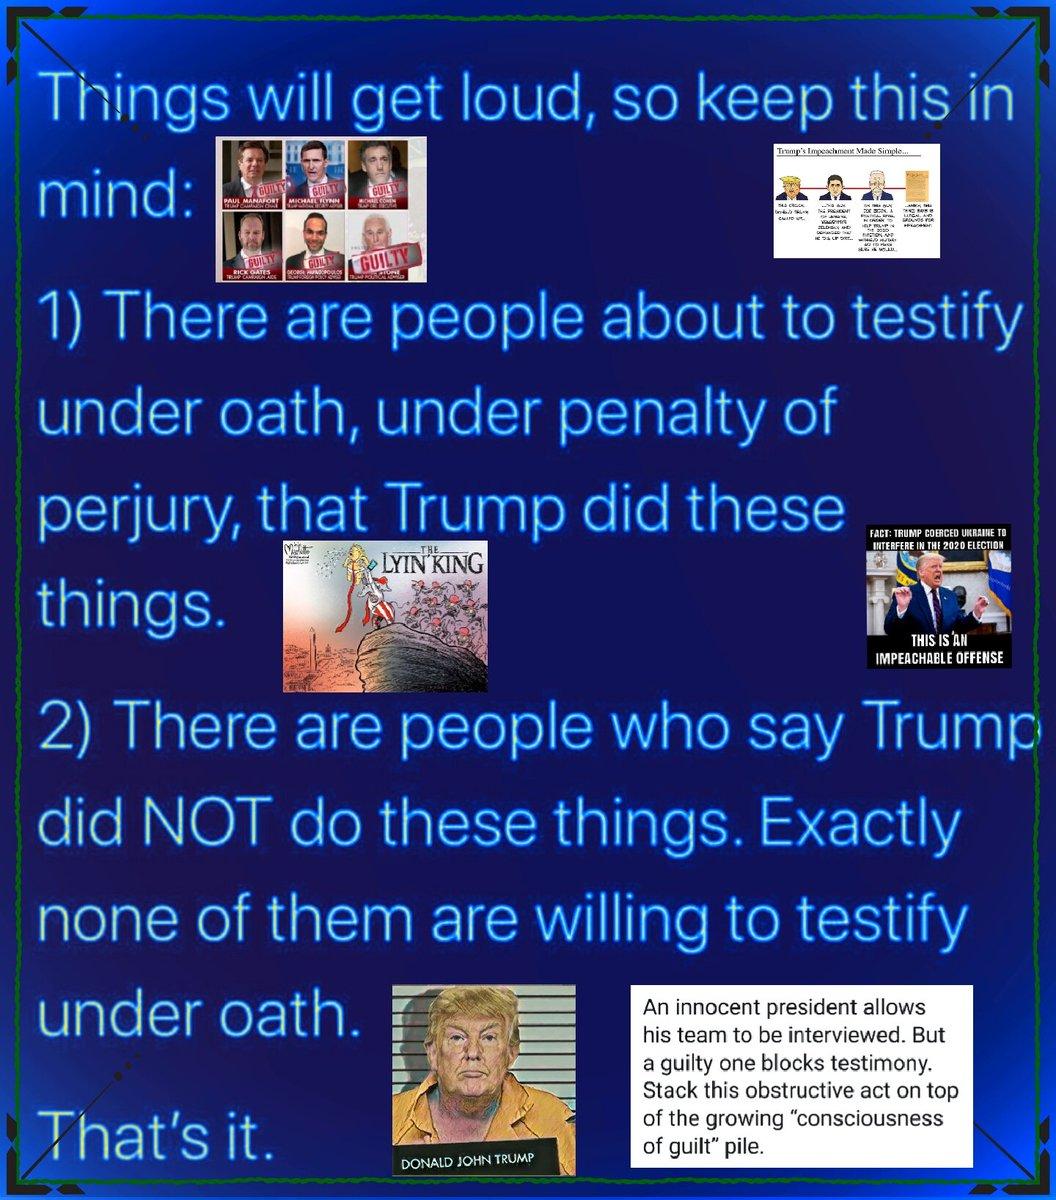 #LyingTrump #TrumpResign #TrumpShutdown #Impeach #crybaby #TrumpCrimeFamilyMustGo #Impeach #TrumpIsARacist #TrumpIsAWhiteSupremacist #voteblue #TrumpBribed #TrumpBribery